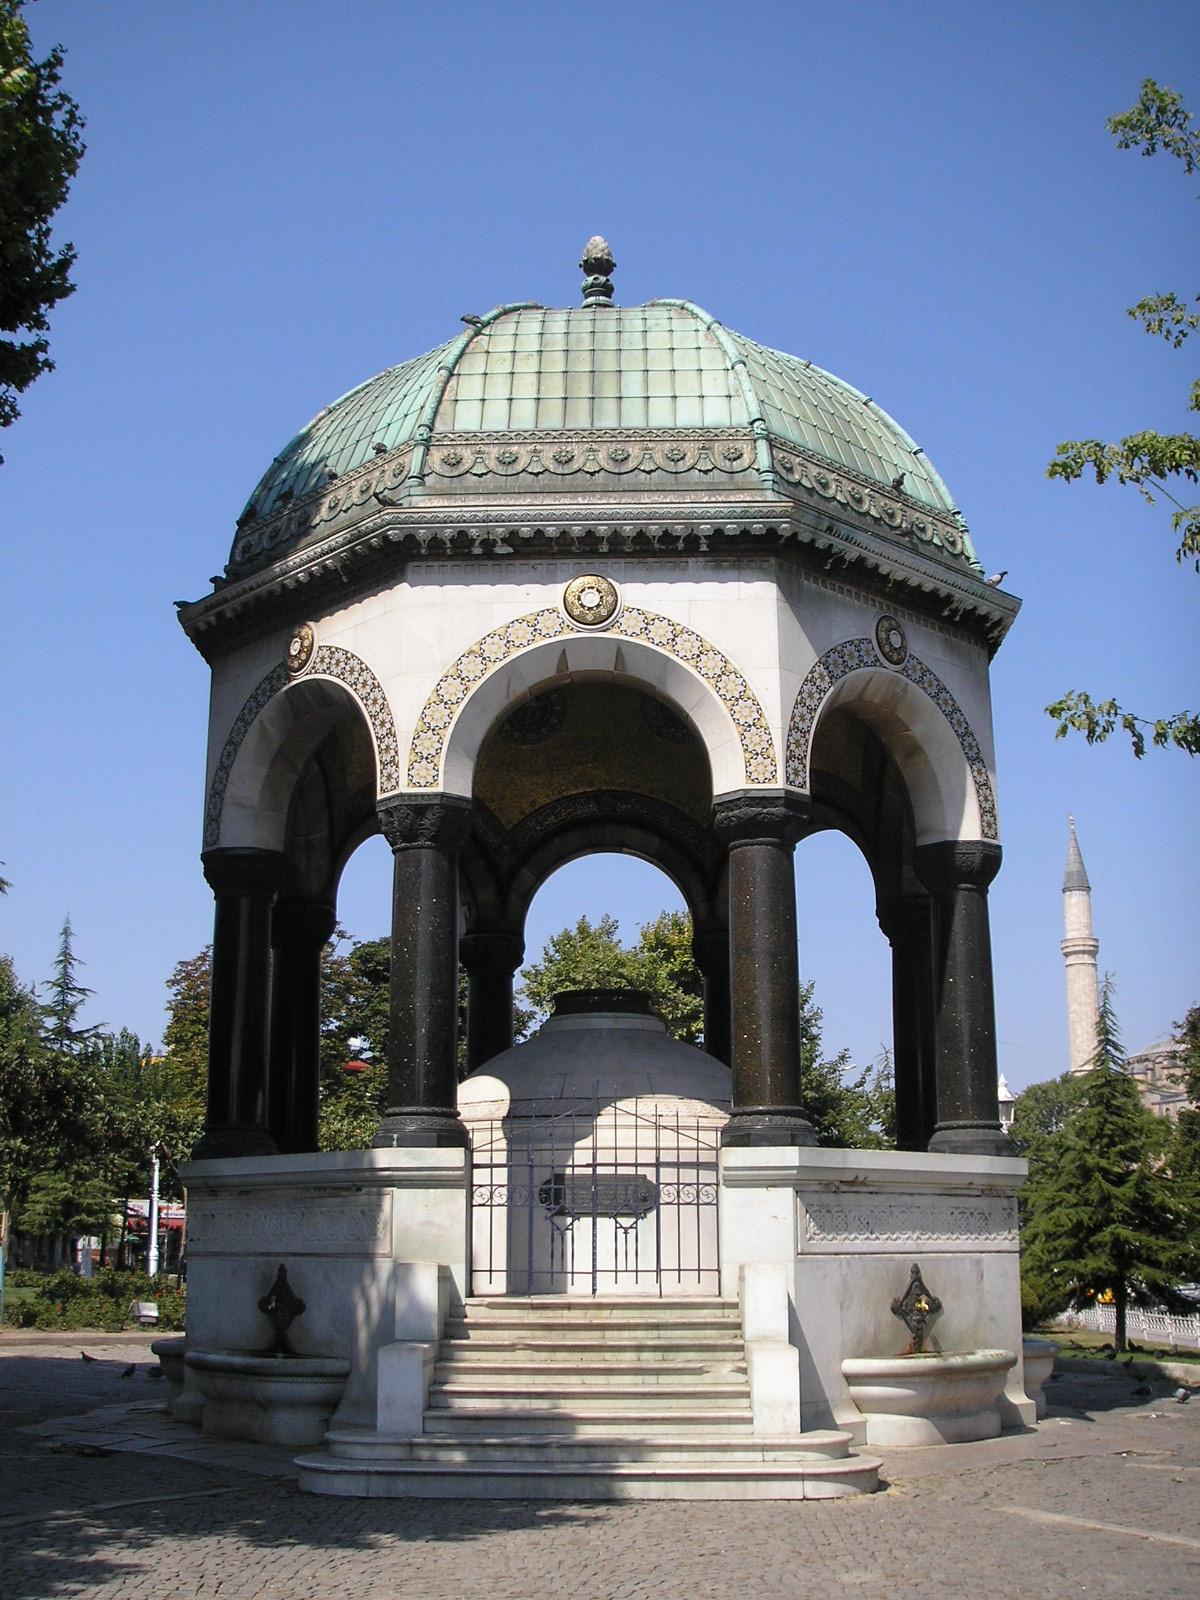 Площадь Султанахмет, Немецкий фонтан